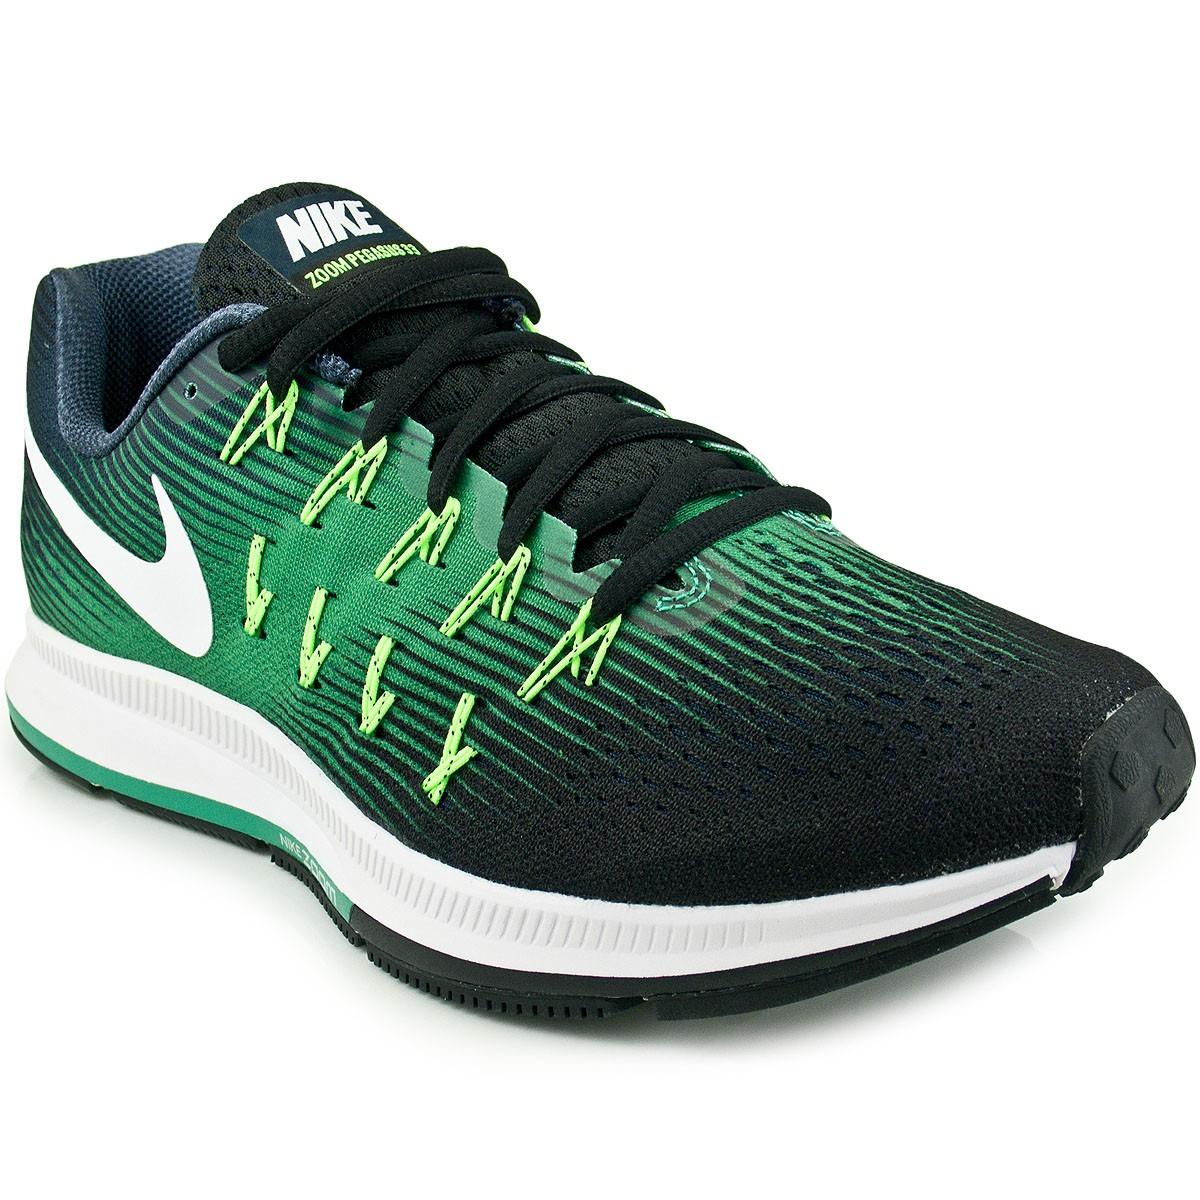 5c4c85cde7 Tênis Nike Air Zoom Pegasus 33 831352